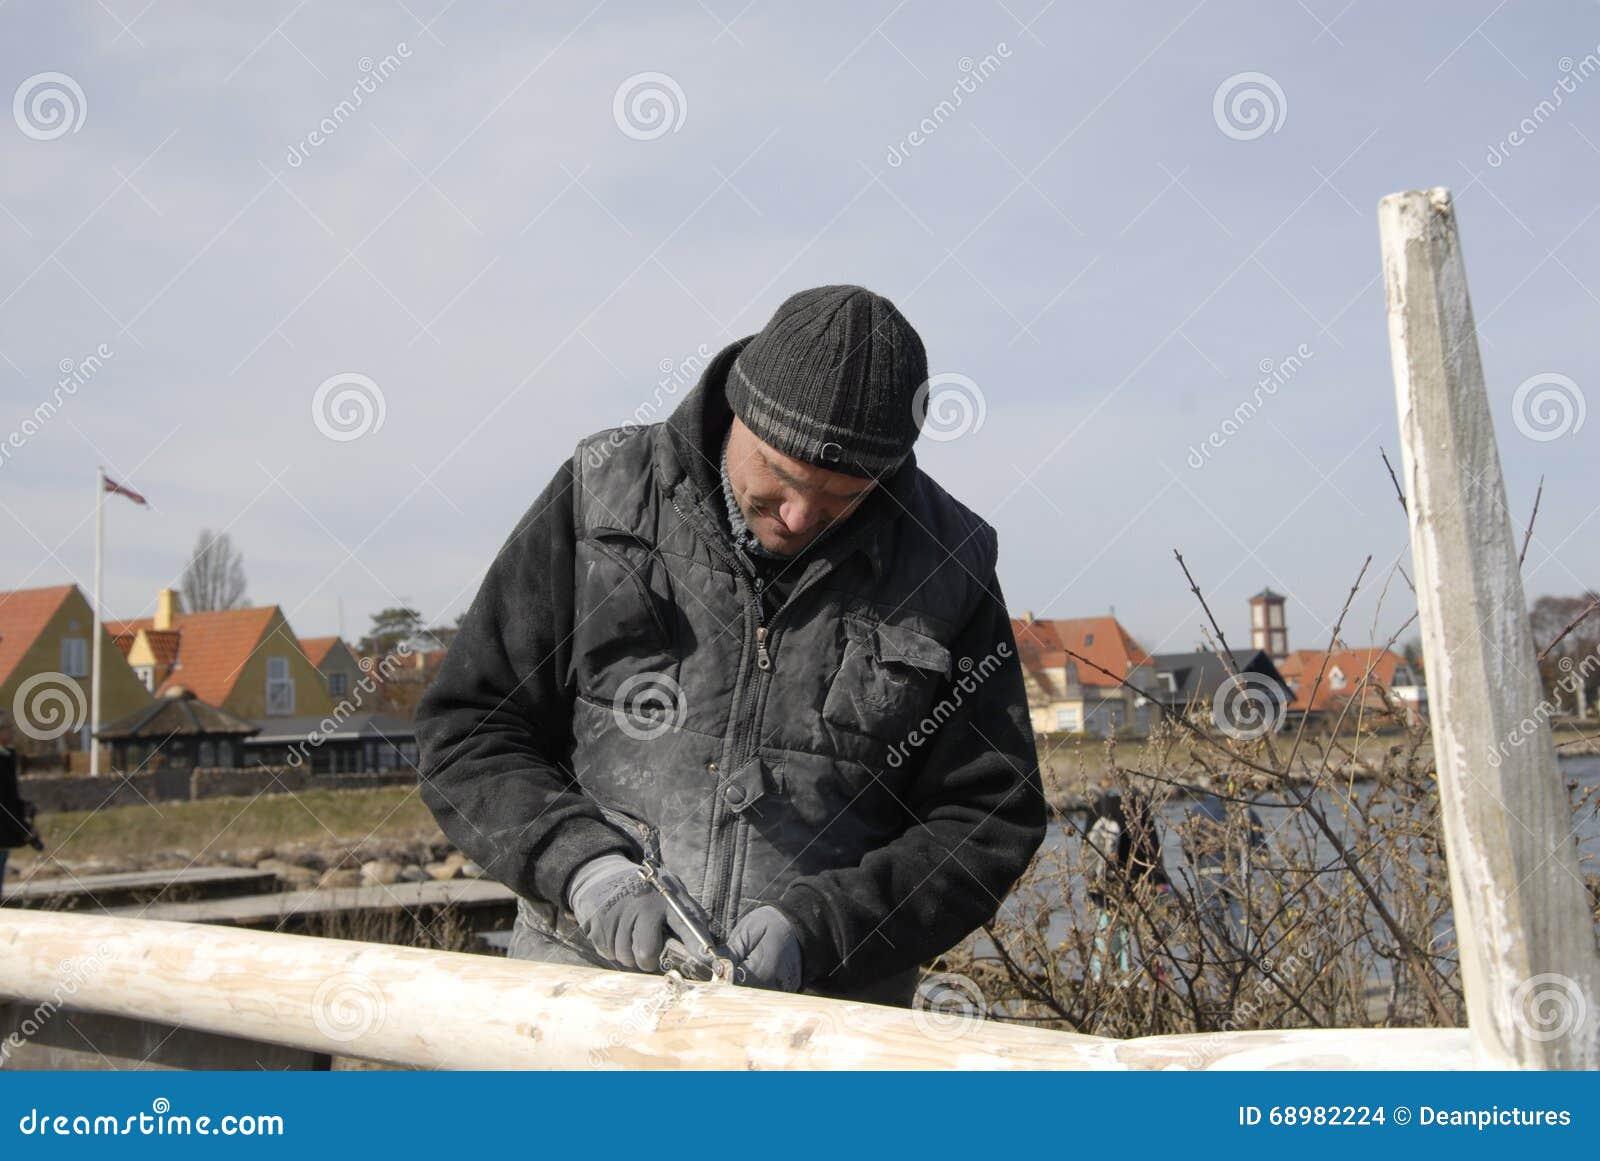 WORKR POLONAIS AU DANEMARK